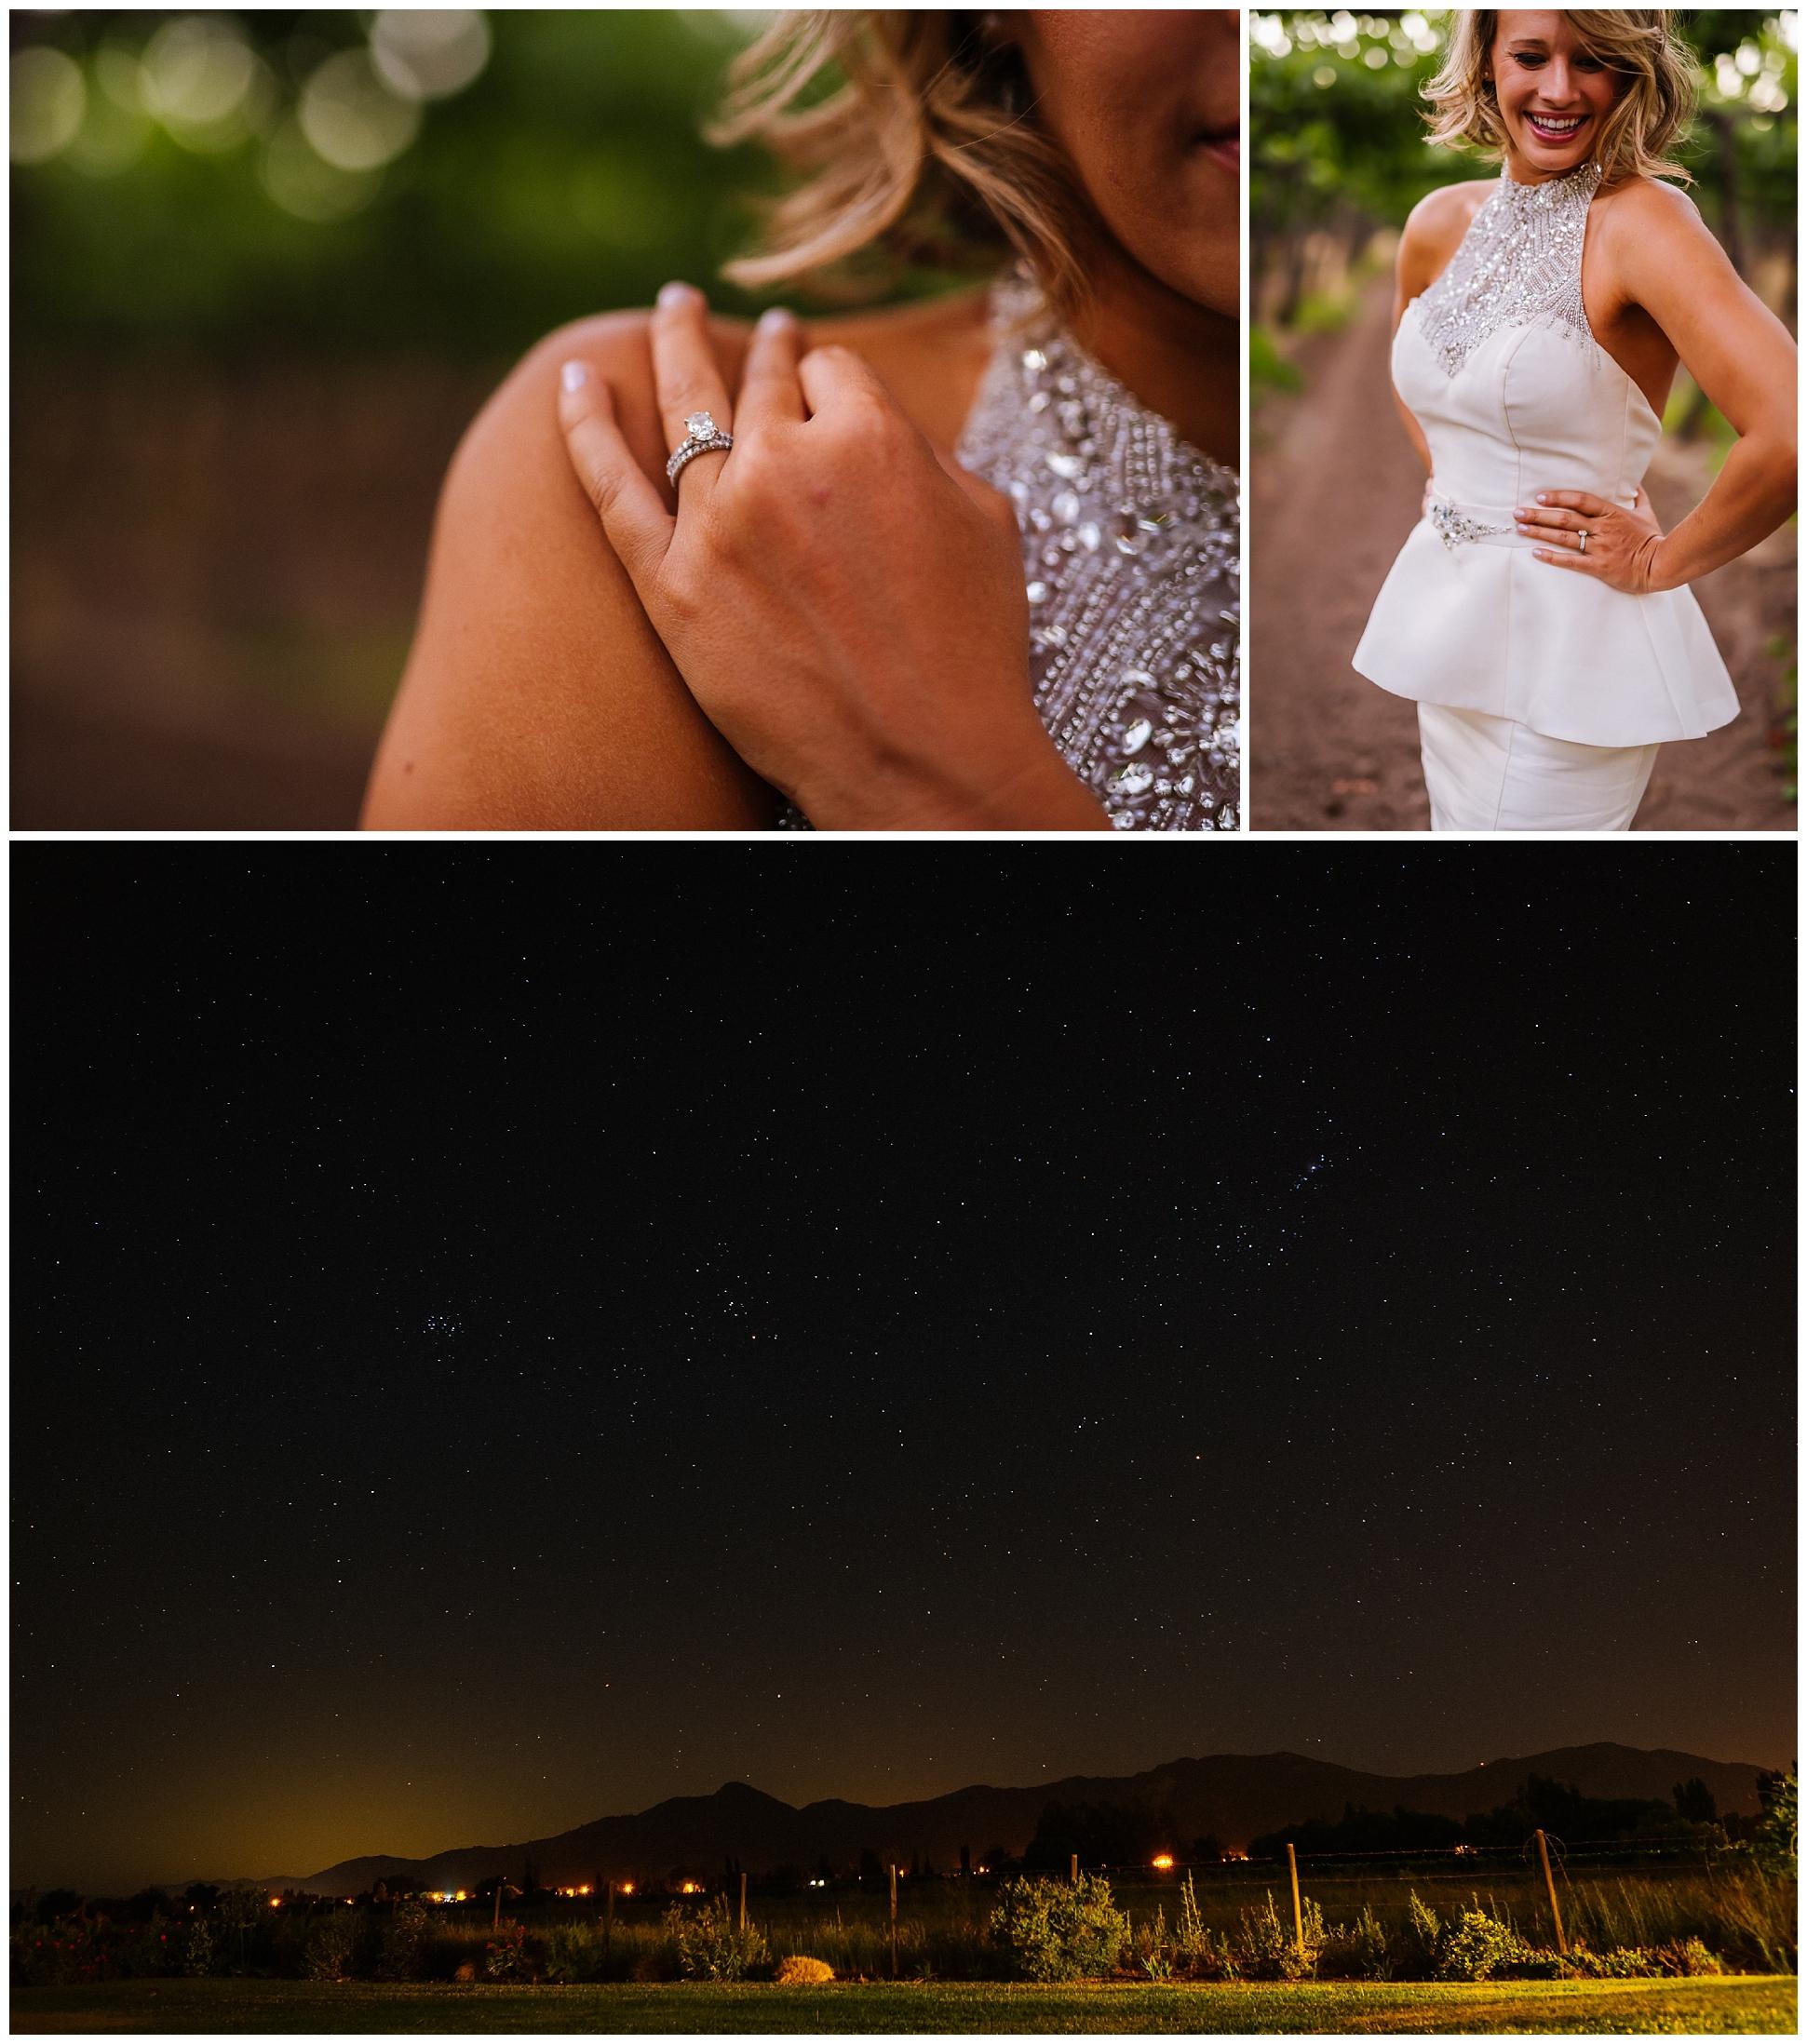 Cheilean-destination-adventure-wedding-florida-patagonia-pucon-santa-cruz-vsco_0150.jpg